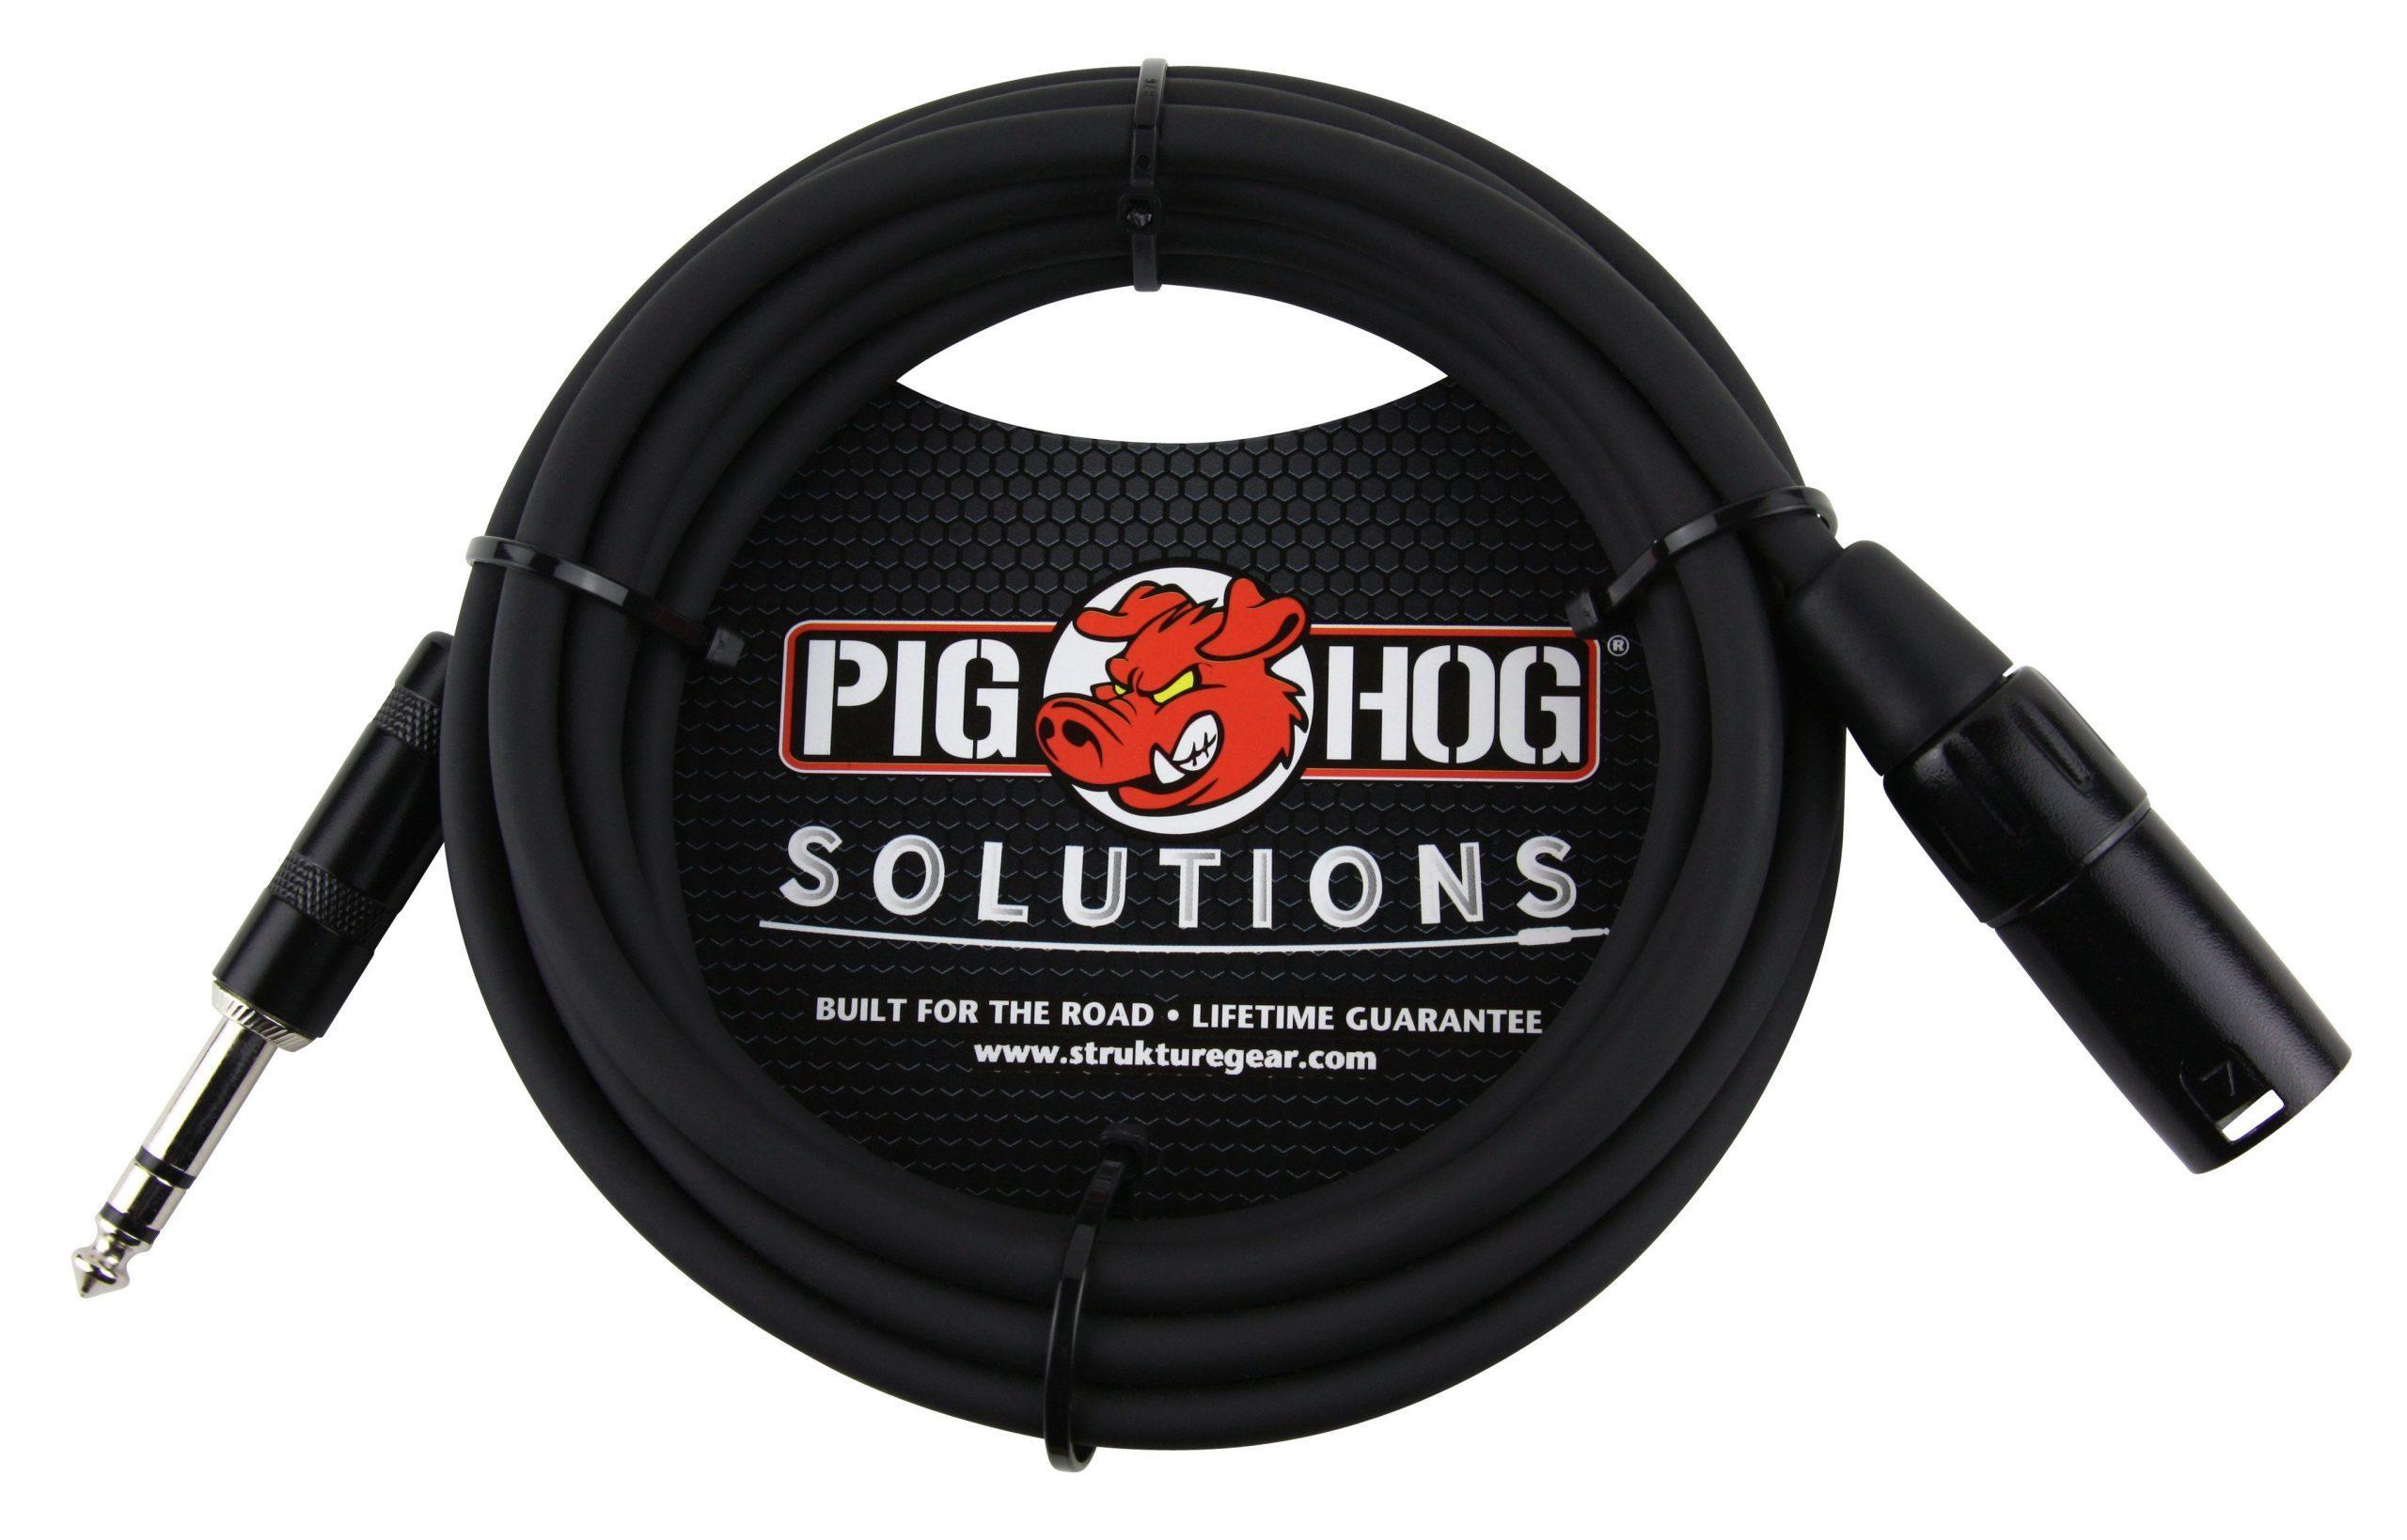 Pig Hog Solutions - 5ft TRS(M)-XLR(M) Balanced Cable